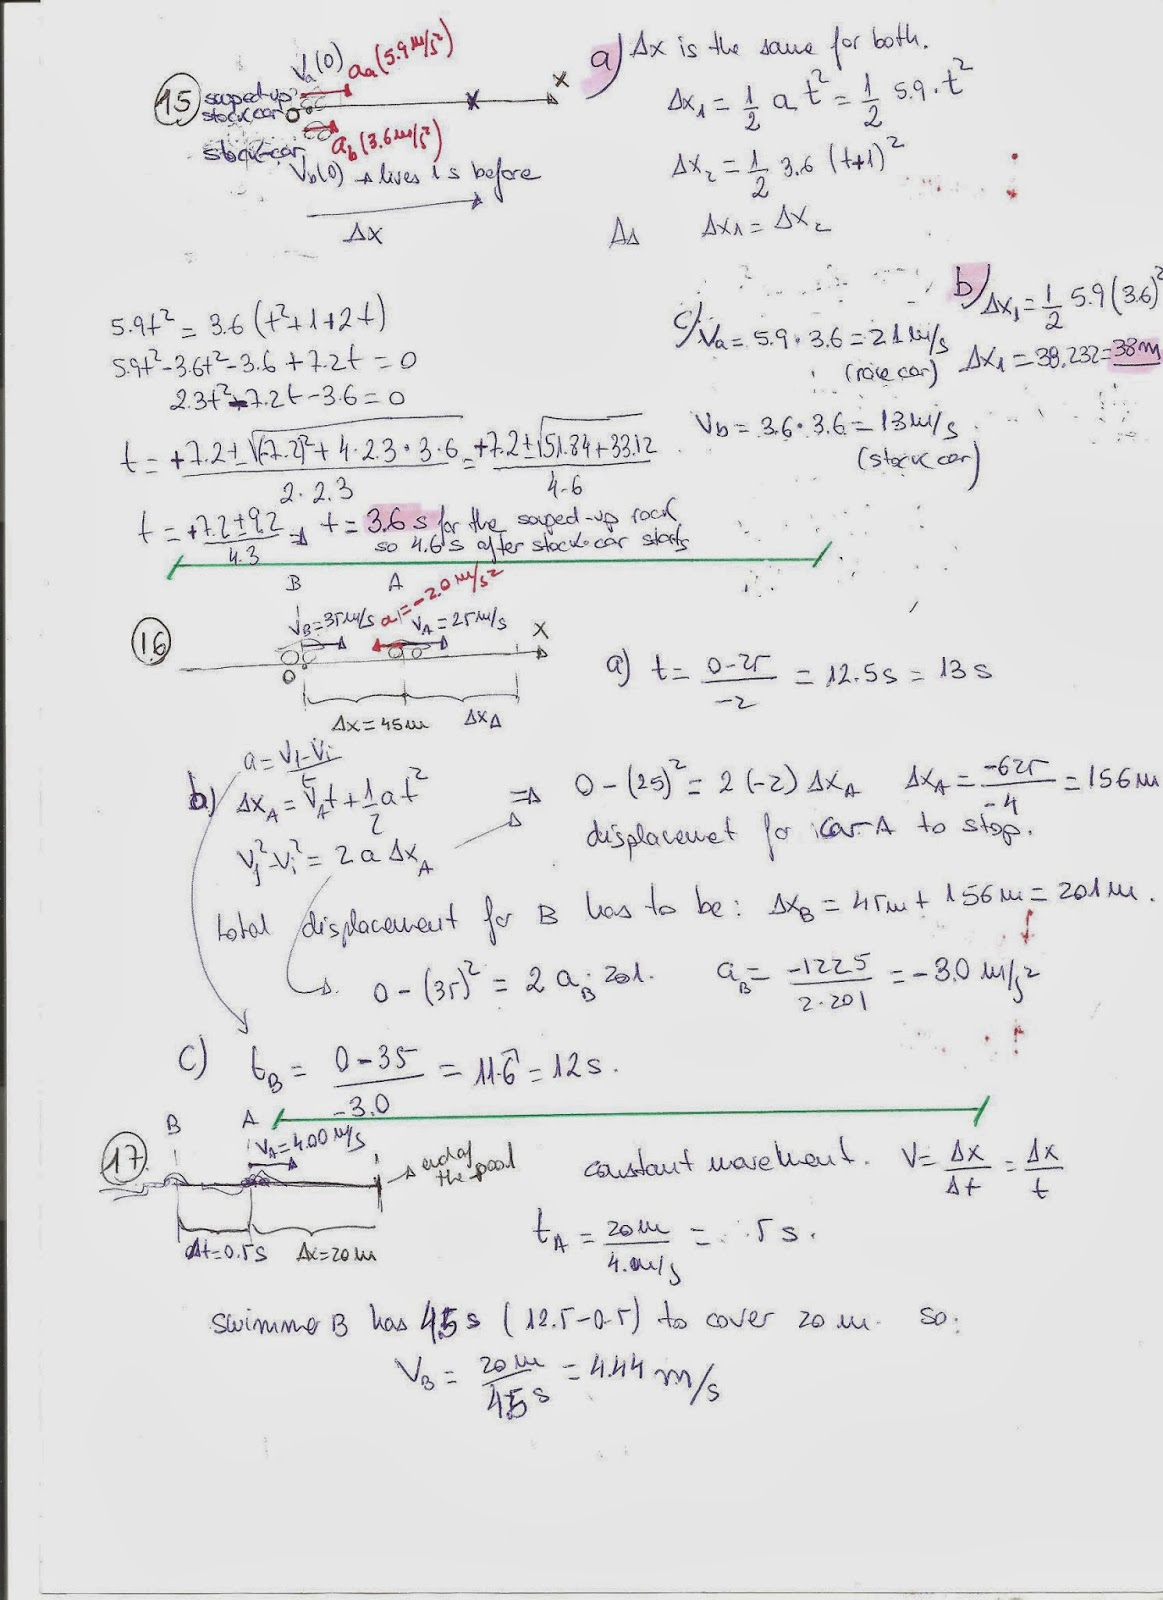 worksheet Chemistry Dimensions 2 Worksheet Solutions activity worksheet 2 solutions motion in one dimension physics publicado 9th november 2017 por carmen hermira